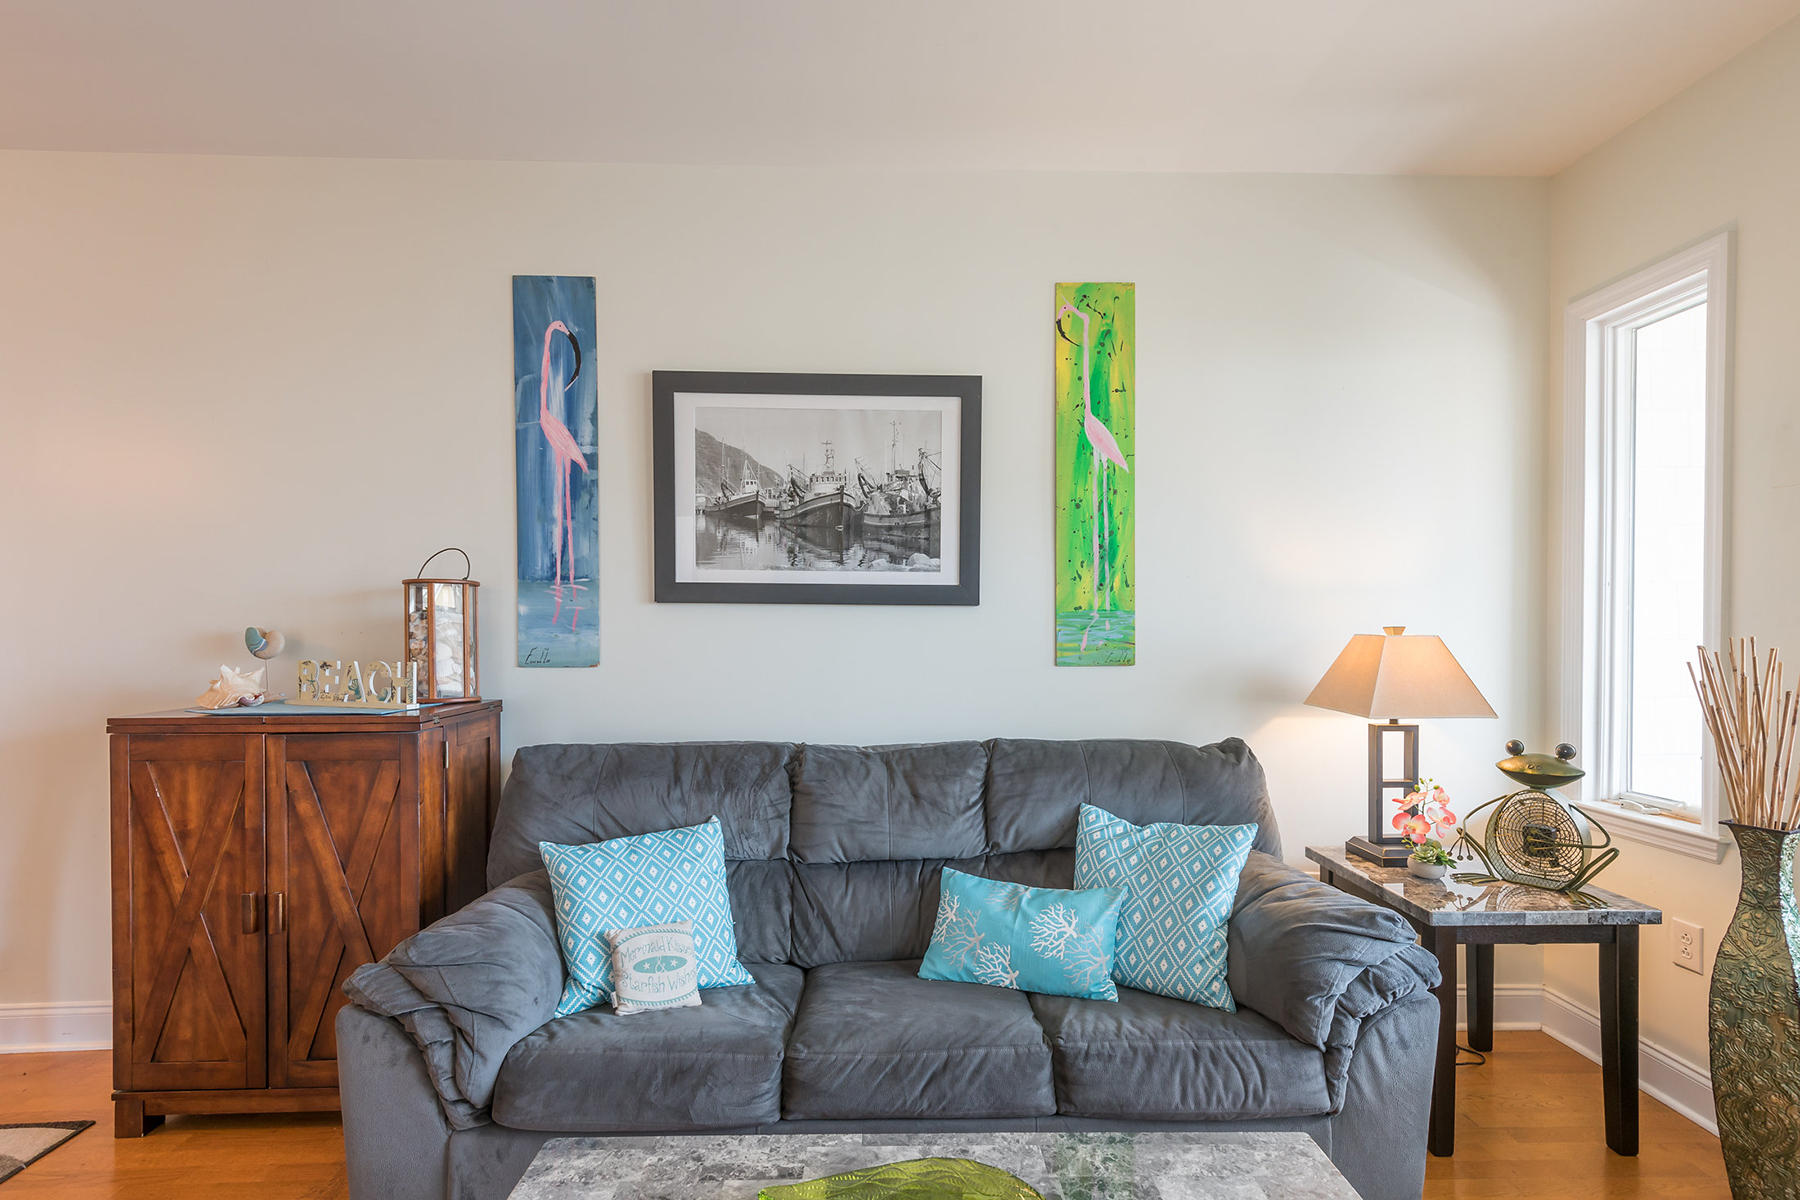 Pier Pointe Villas Homes For Sale - 114 Ashley, Folly Beach, SC - 27